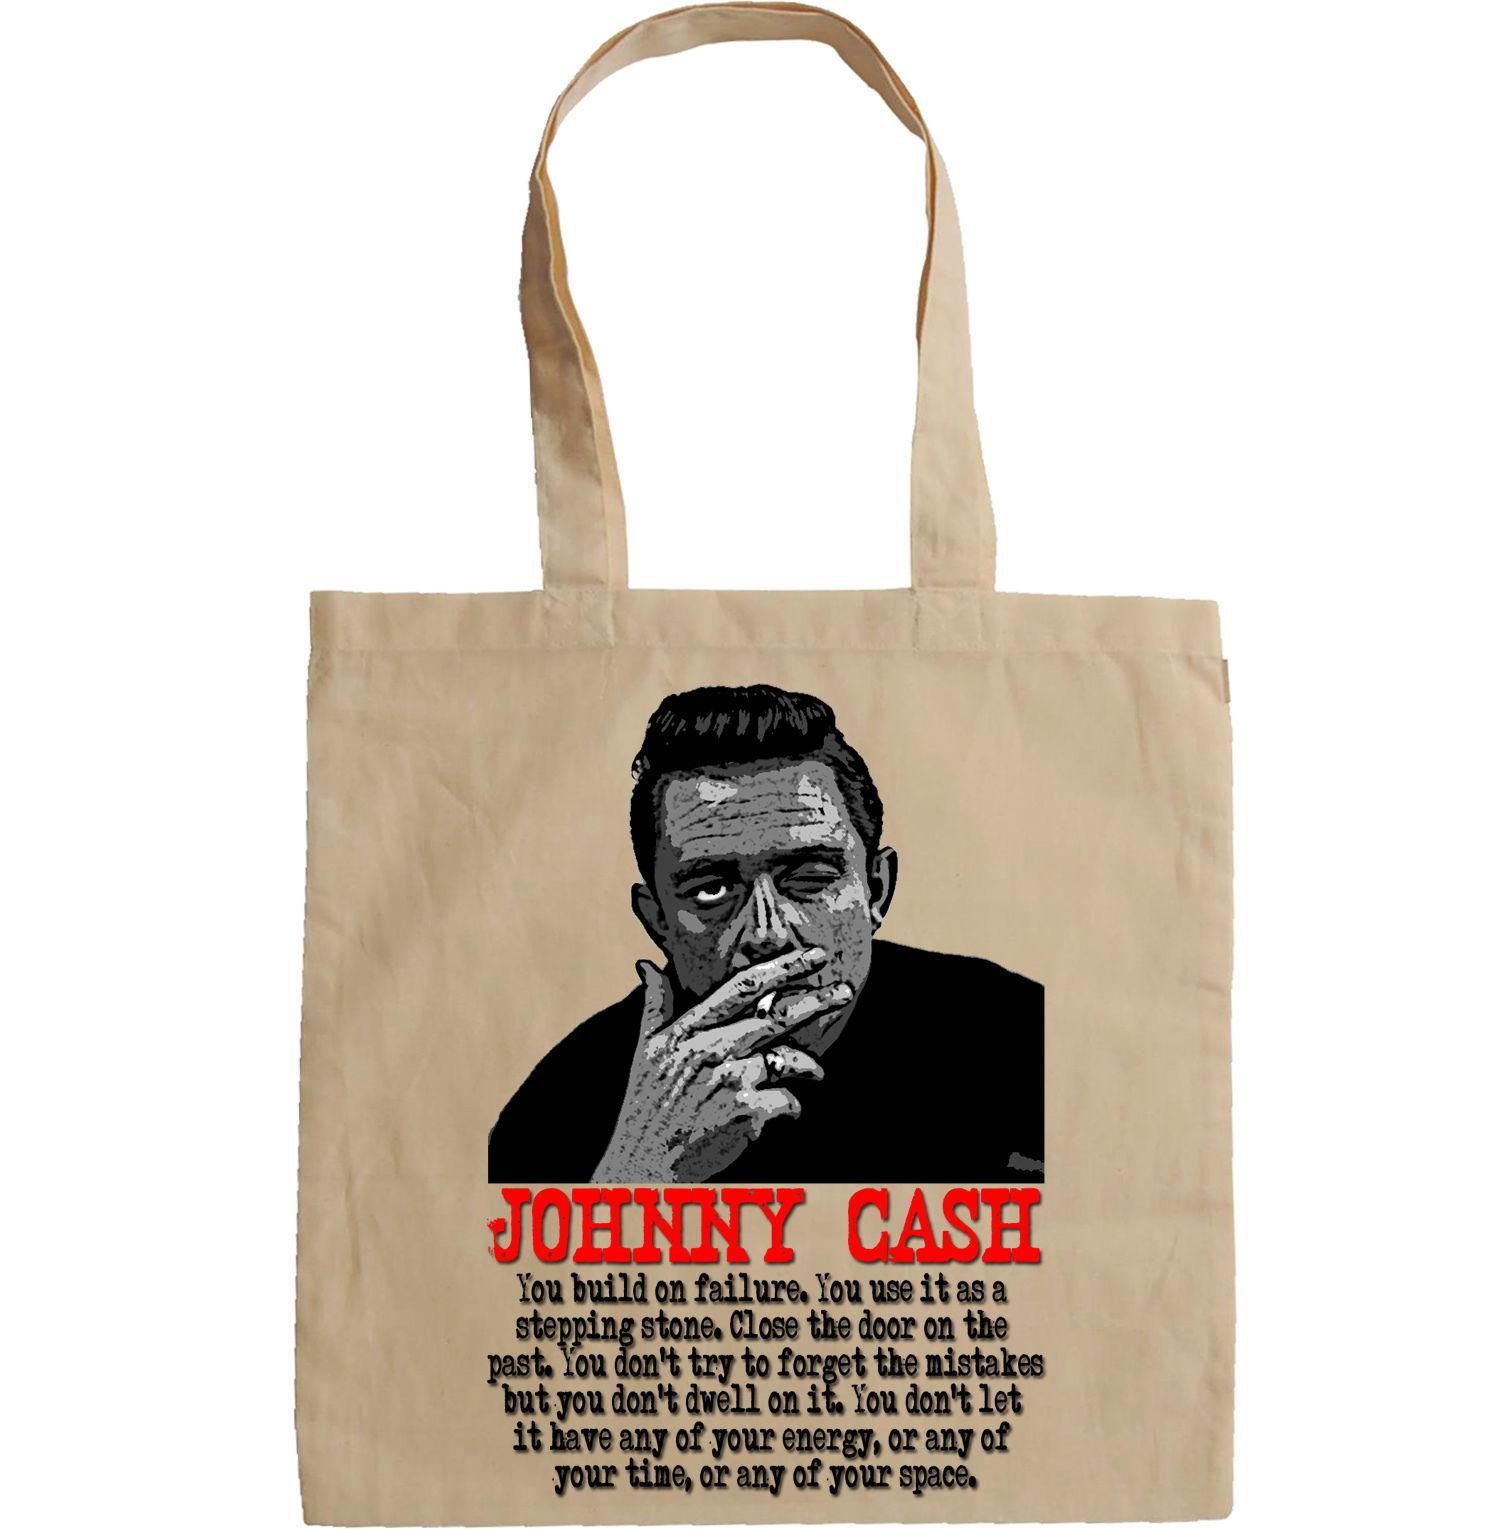 JOHNNY CASH SINGER LEGEND - NEW AMAZING GRAPHIC HAND BAG/TOTE BAG